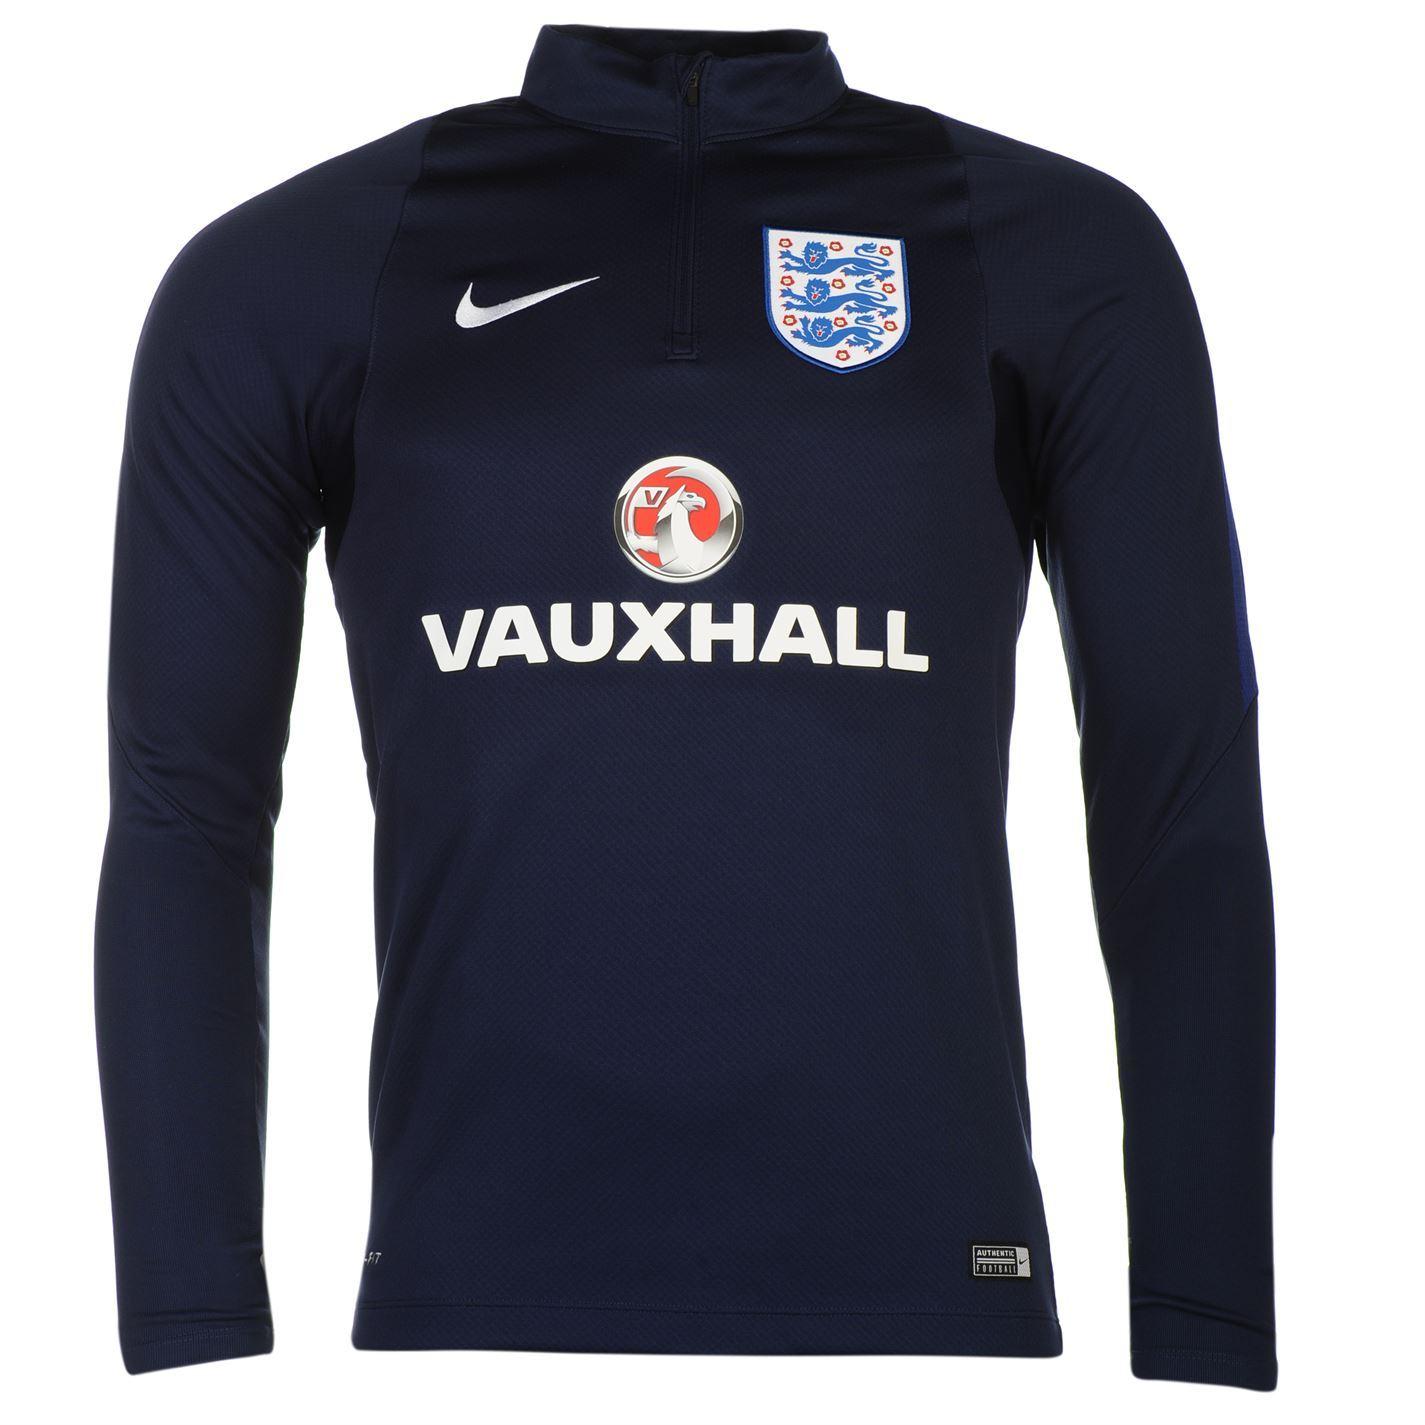 Nike England Mens Drill Training Sweatshirt Mens Navy/Royal Football Soccer Top